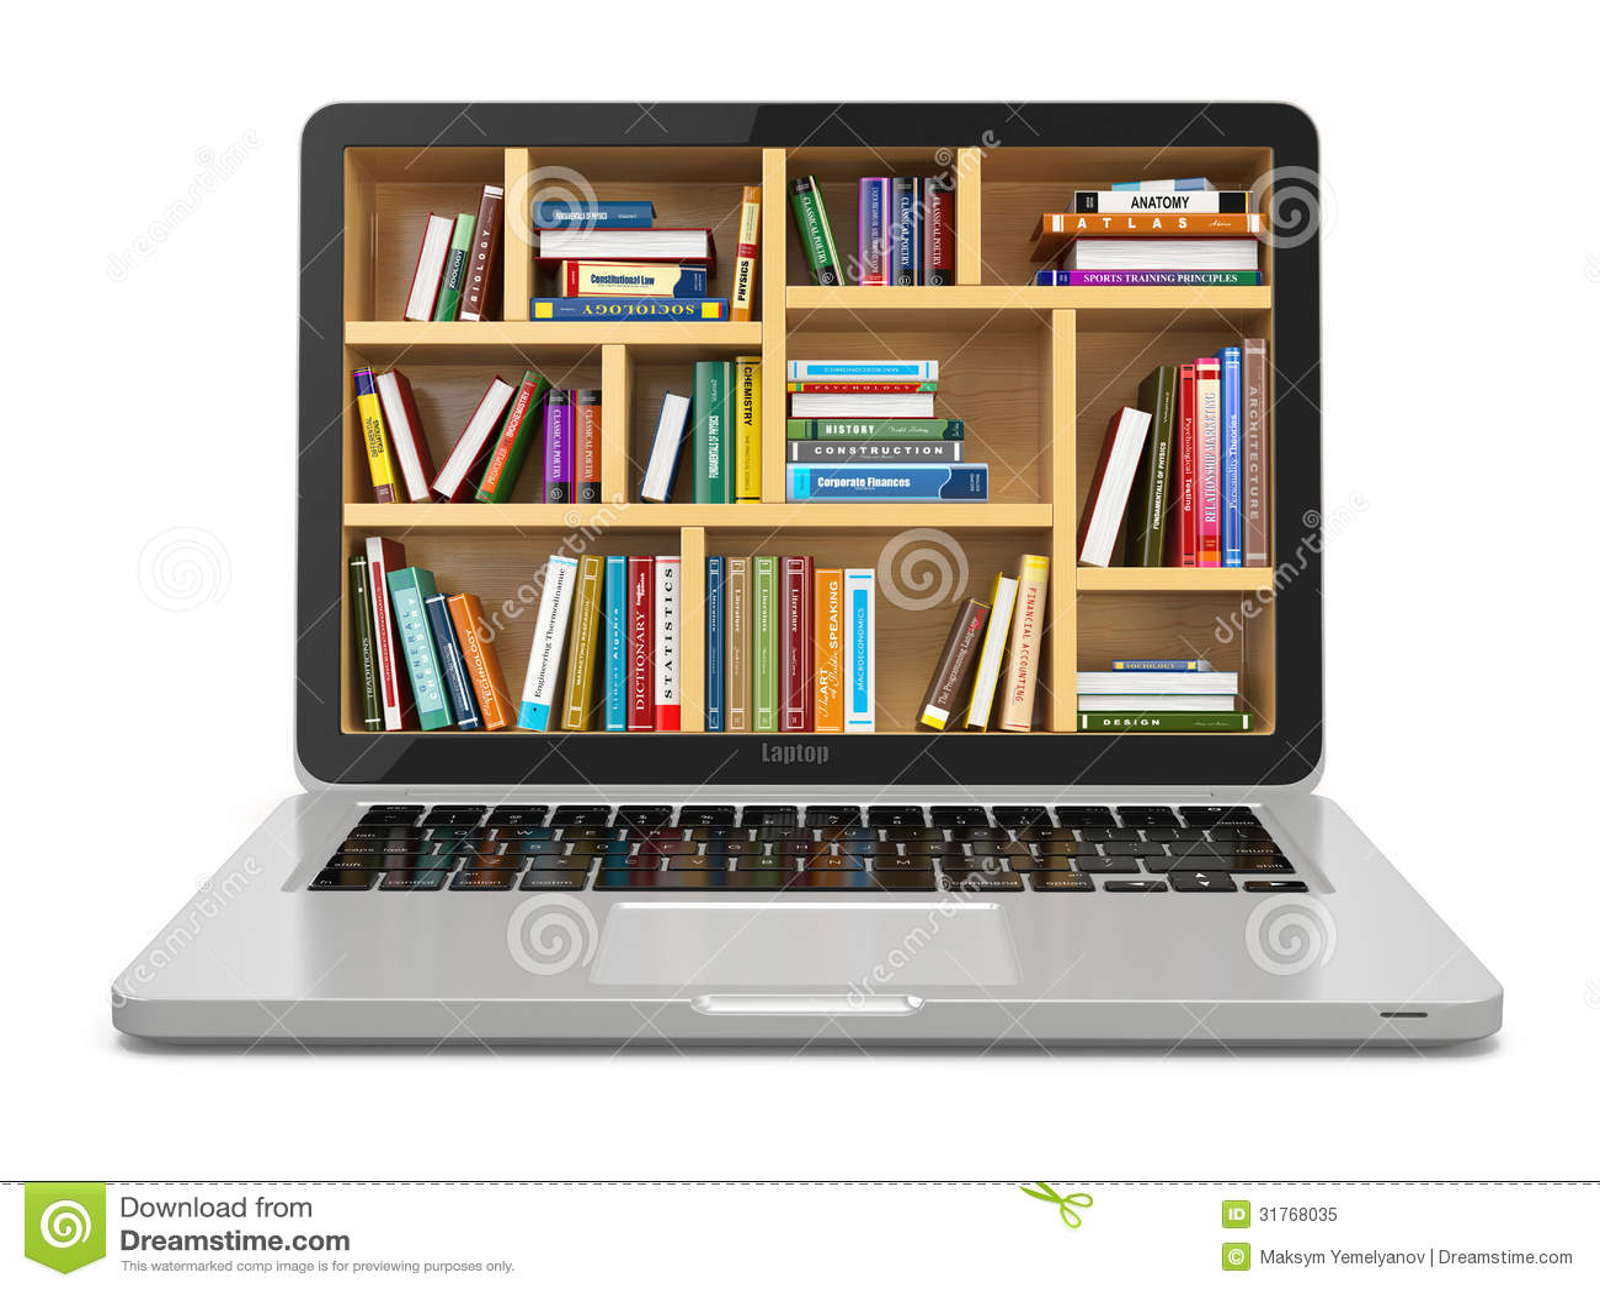 John Naughton's top 10 books about the internet